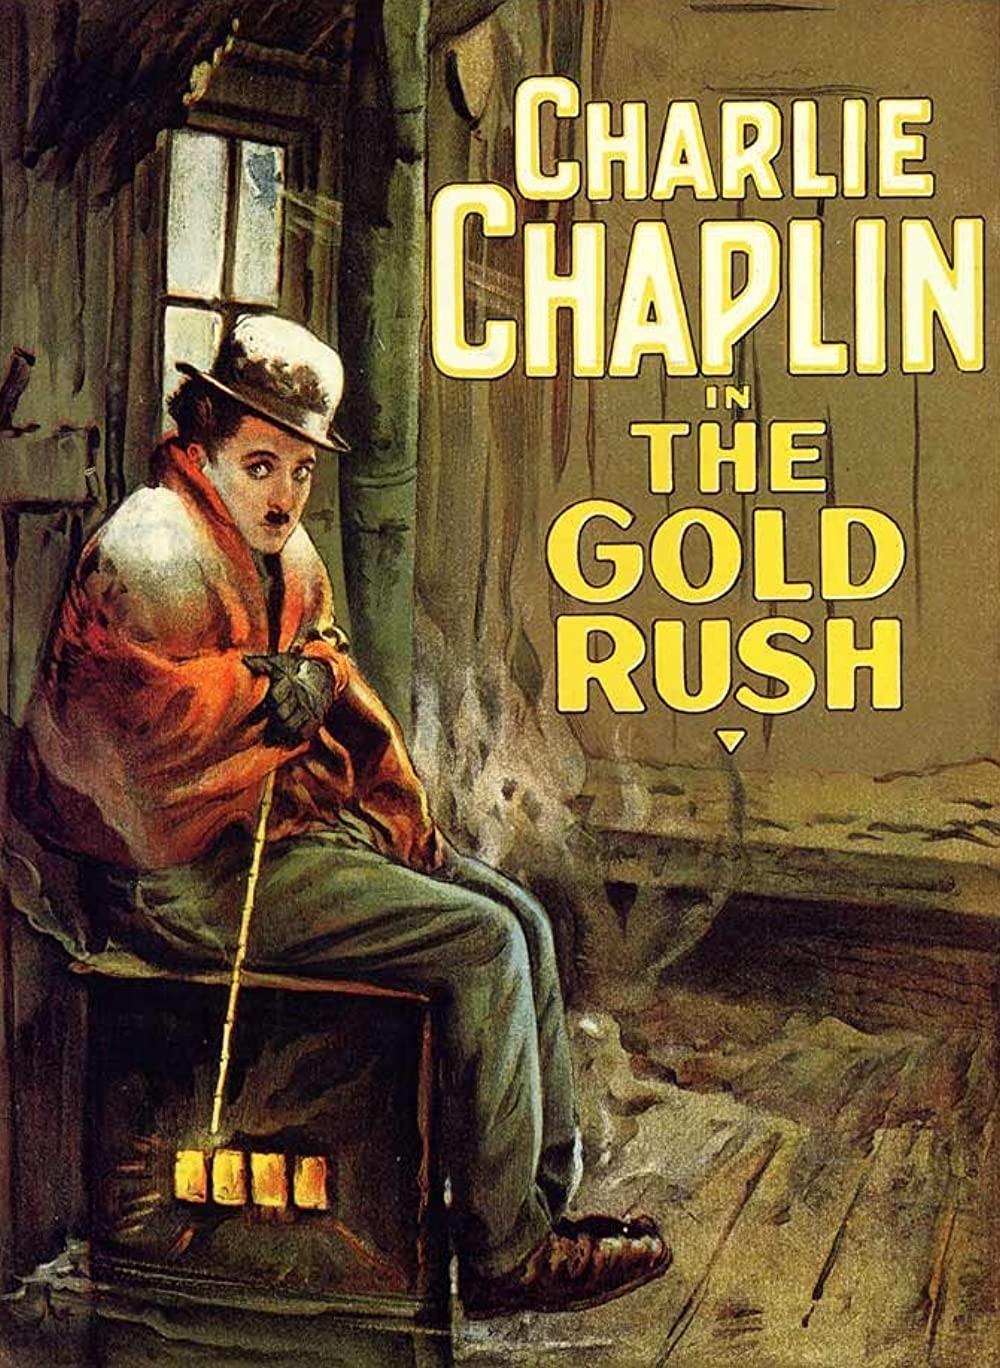 THE GOLD RUSH [1925]